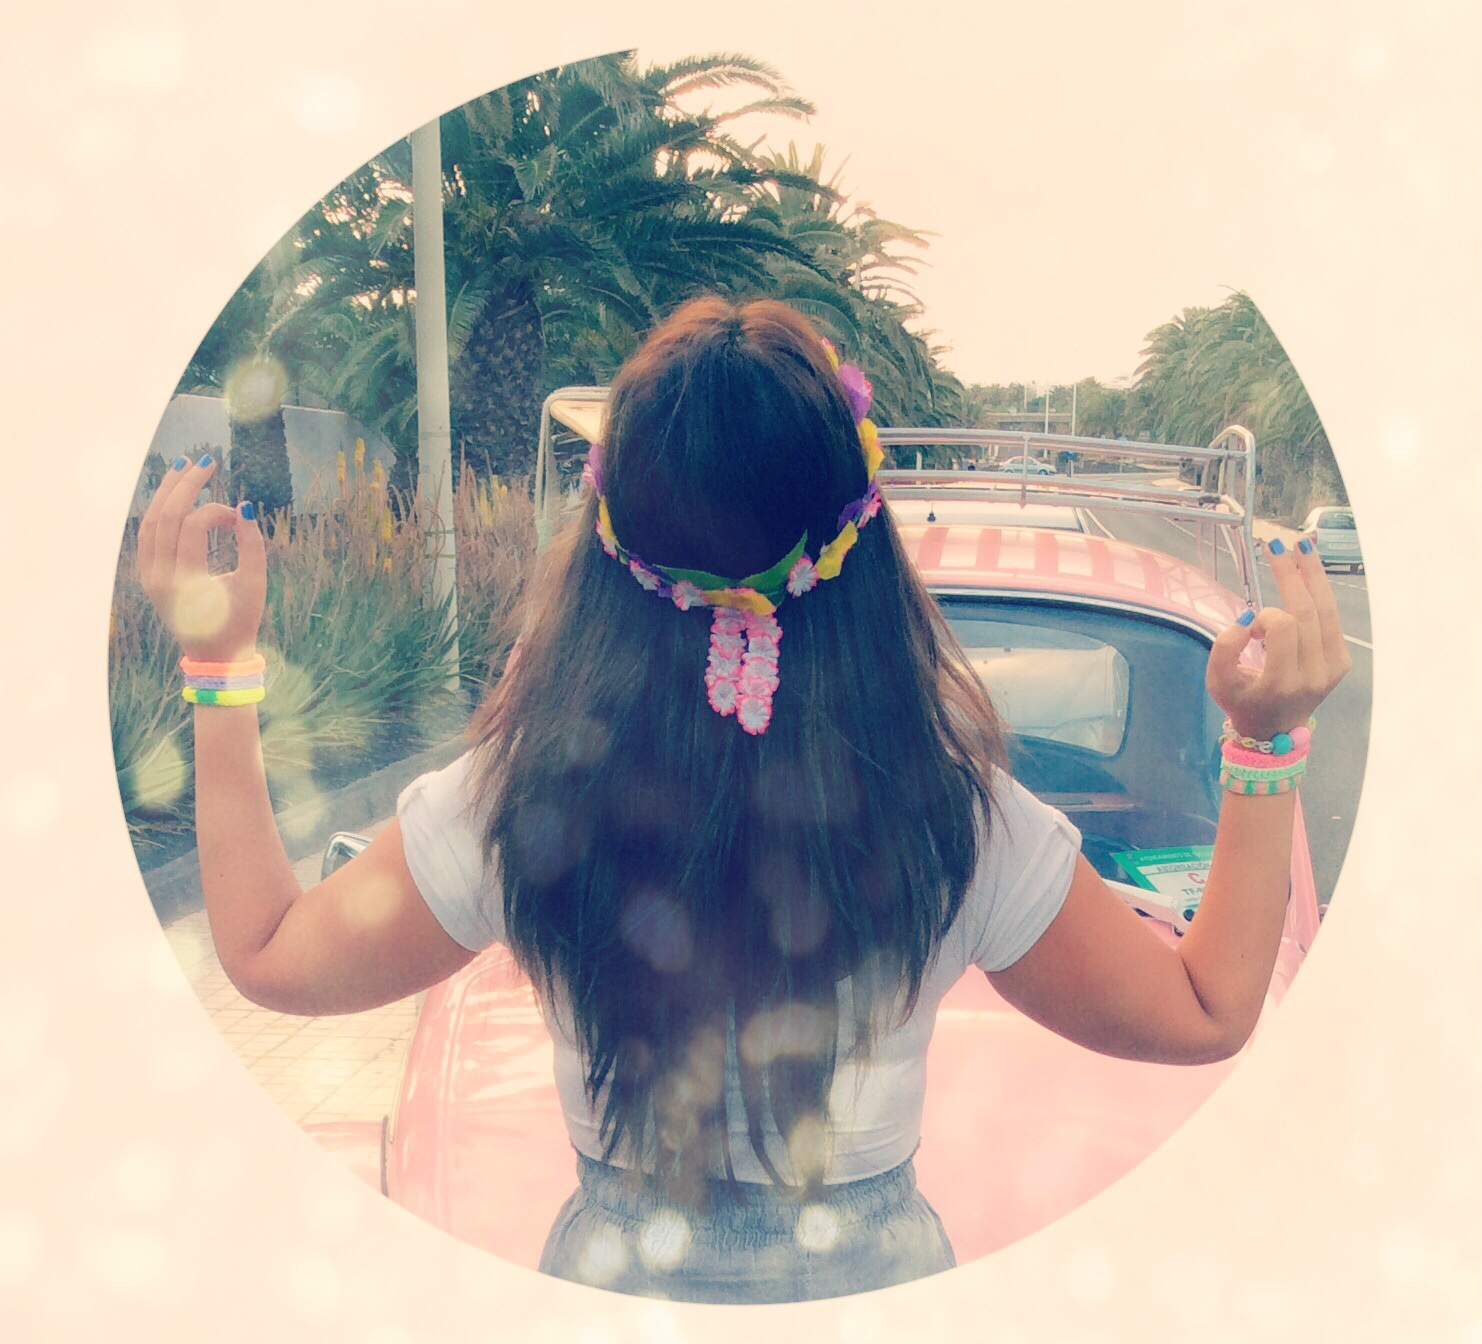 Imagine_Peace_The_Pink_Graff_02